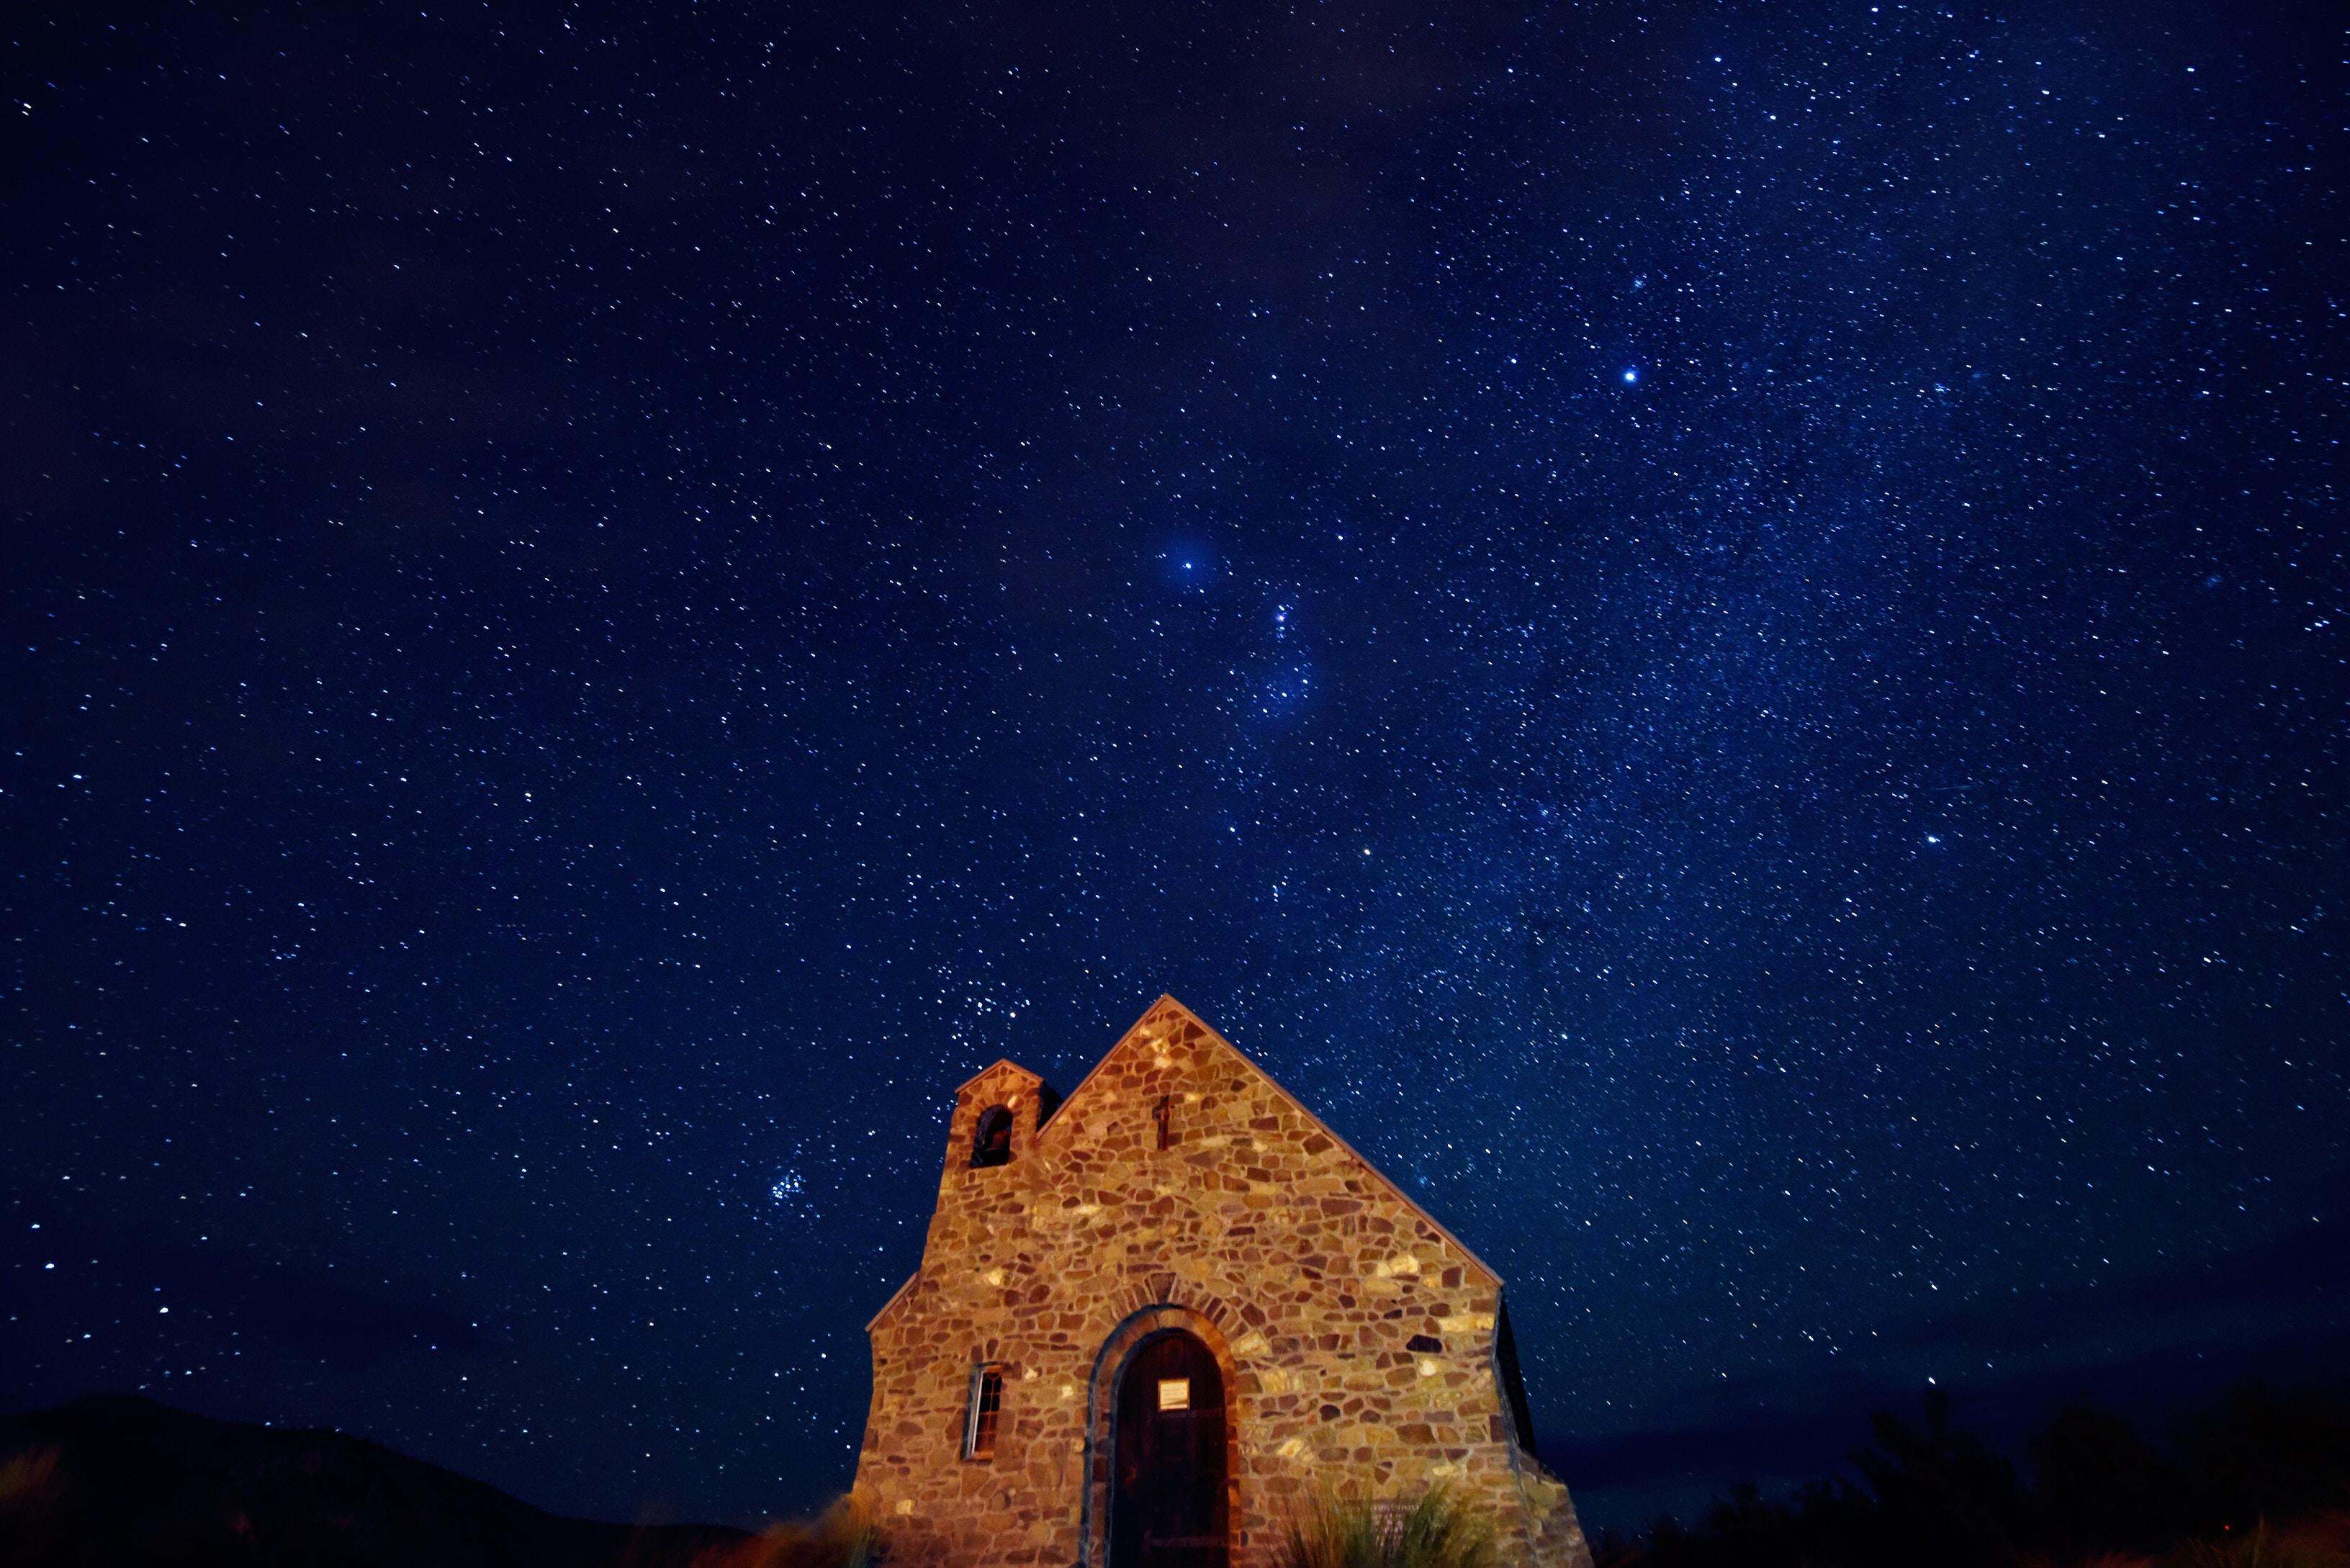 brown brick house under starry night